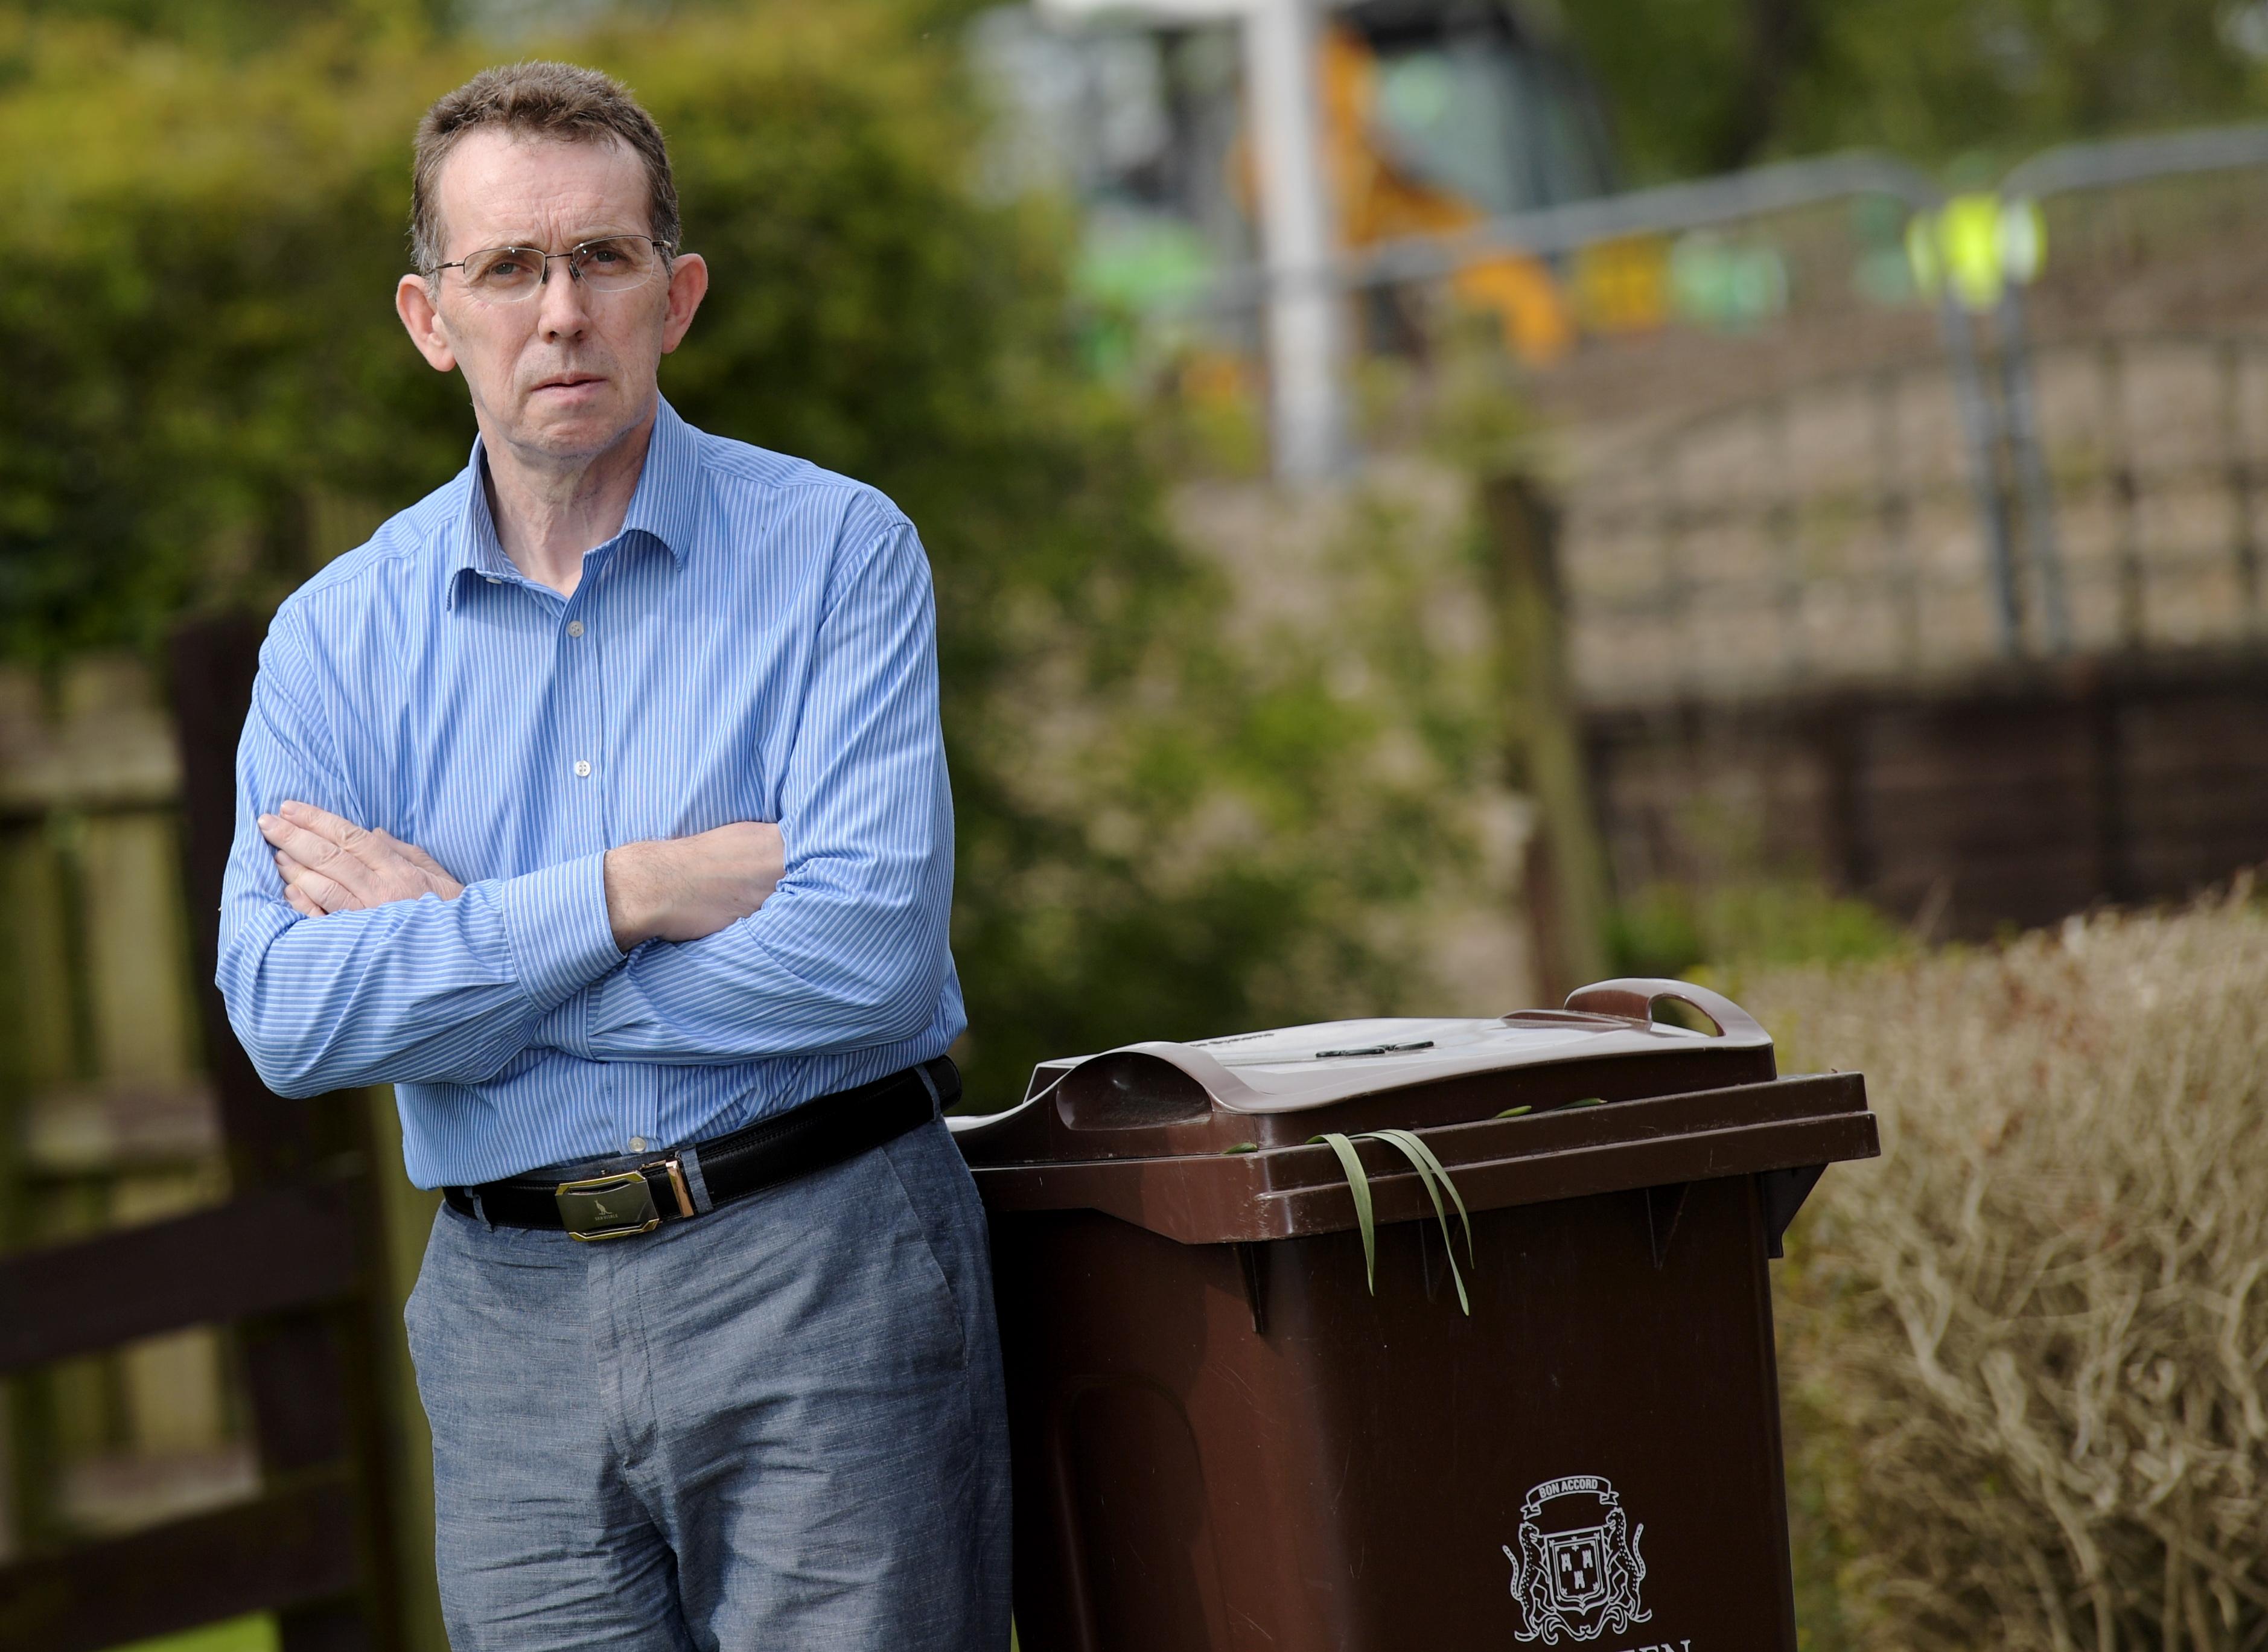 Councillor Steve Delaney